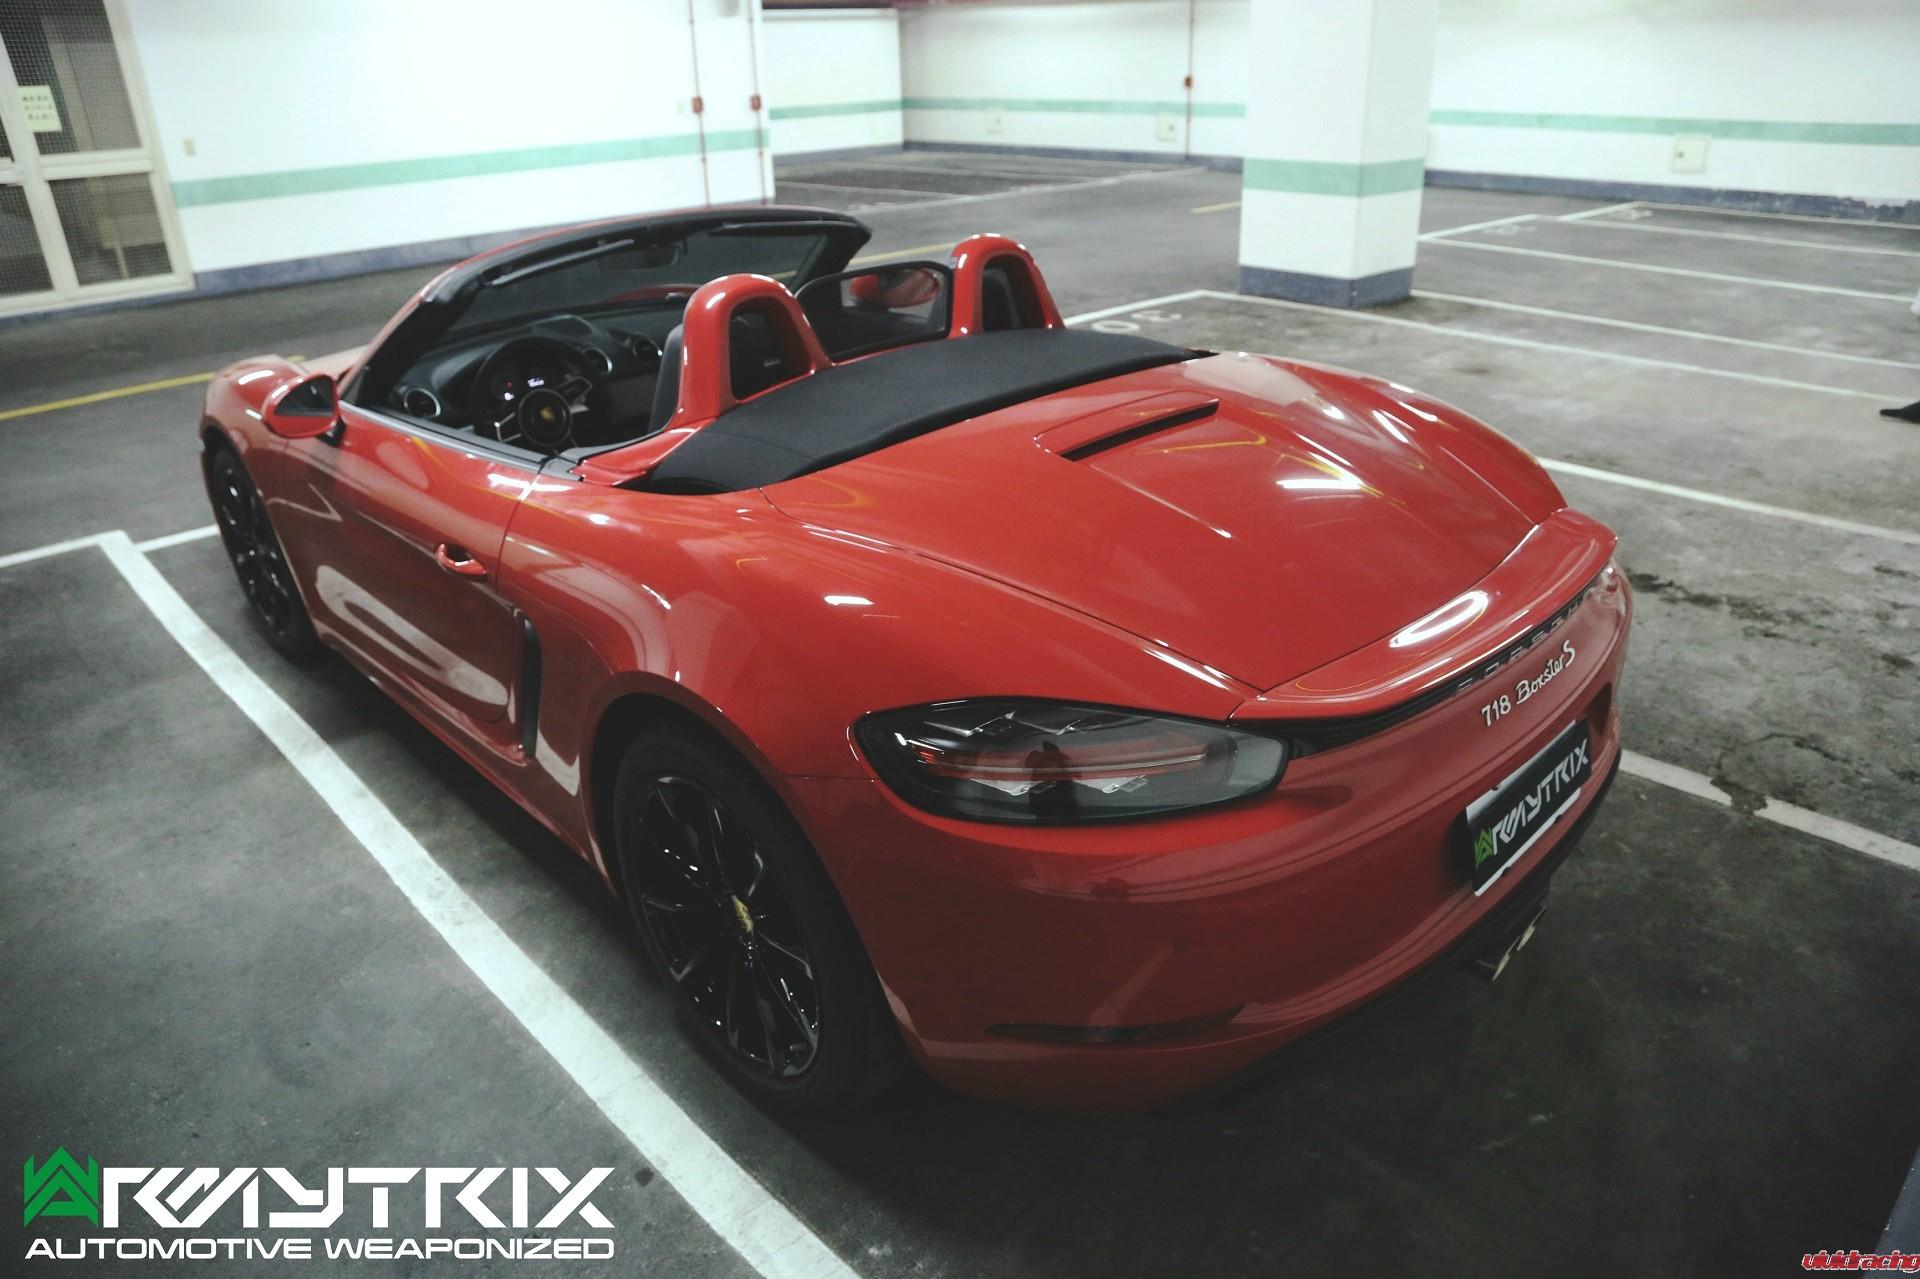 Armytrix, valvetronic exhaust, Porsche 718 Boxster S